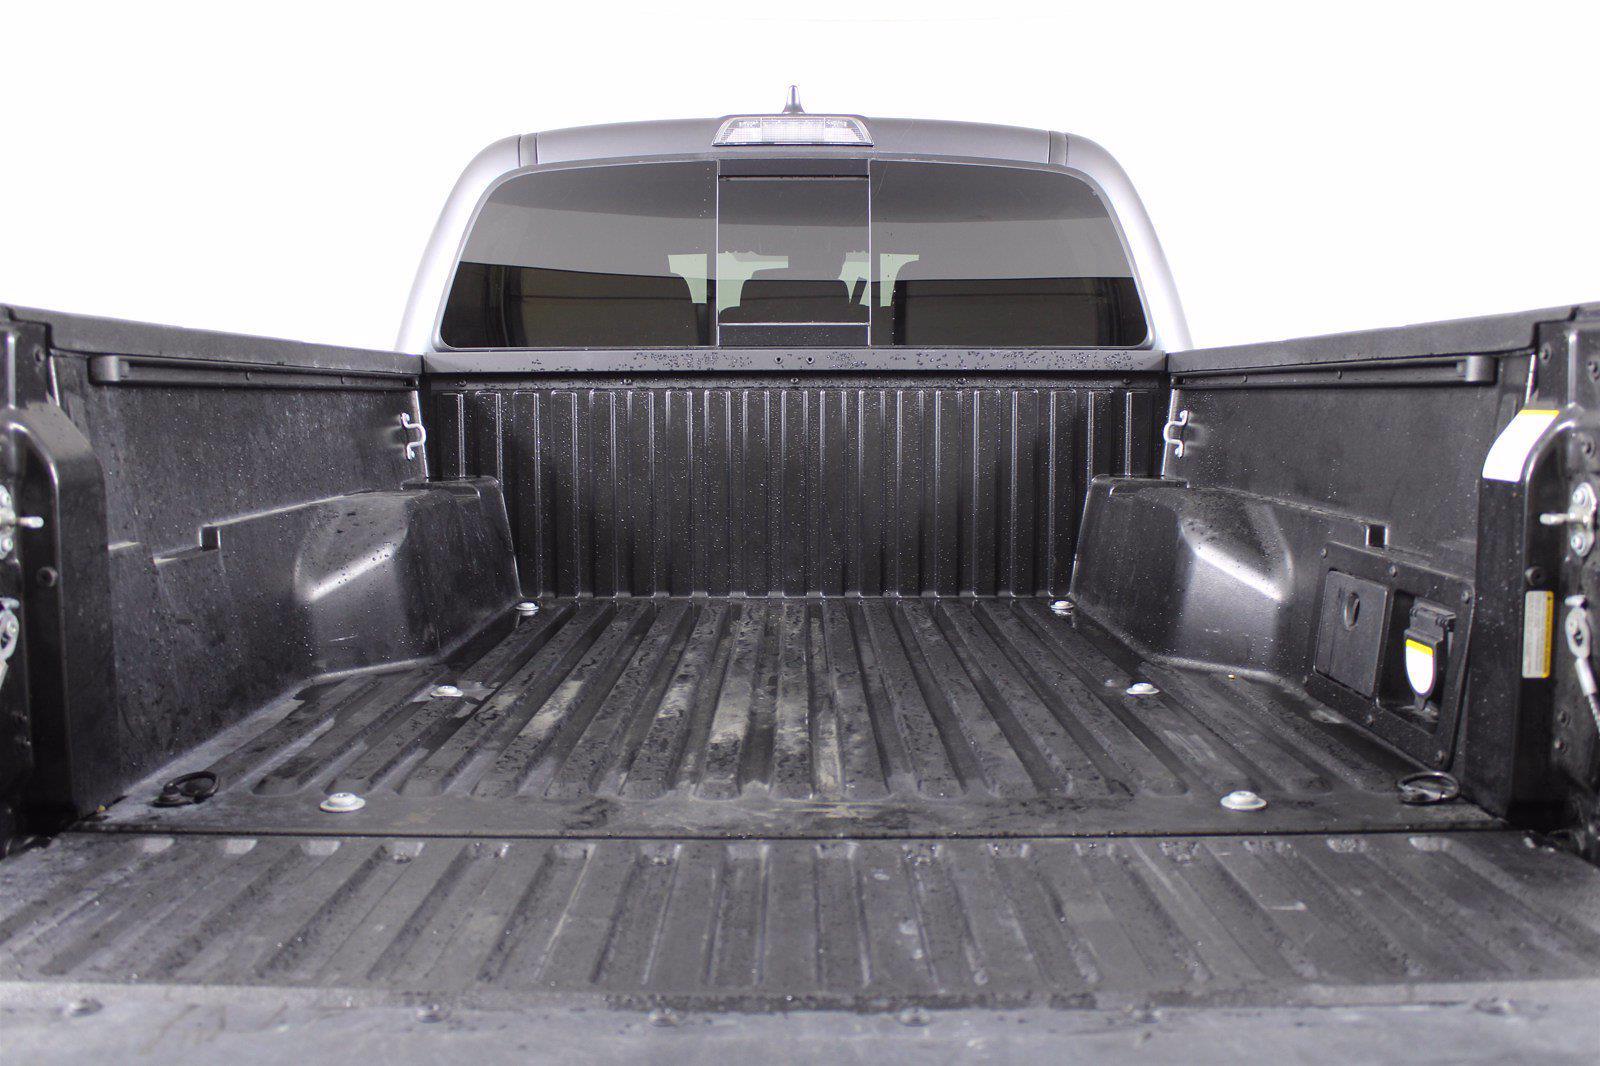 2020 Tacoma Double Cab 4x4,  Pickup #D410879B - photo 6